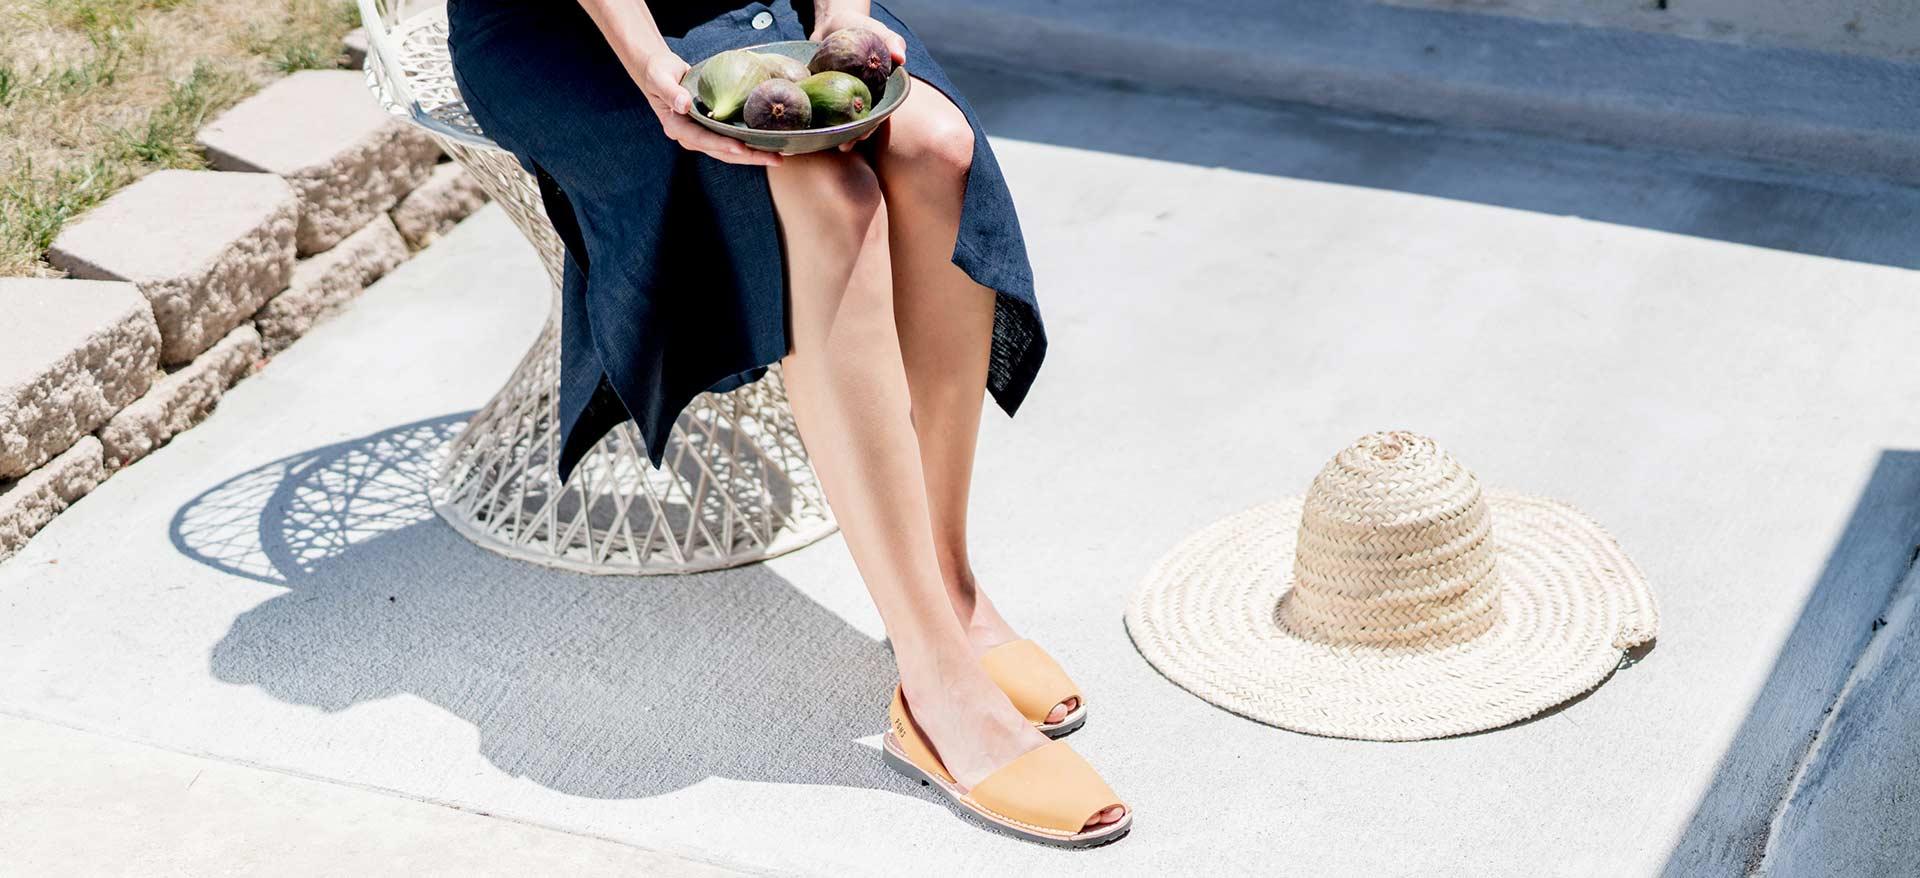 In Leather Avarca Handmade Avarcas By Spain Usa Pons Sandals LA435Rqj